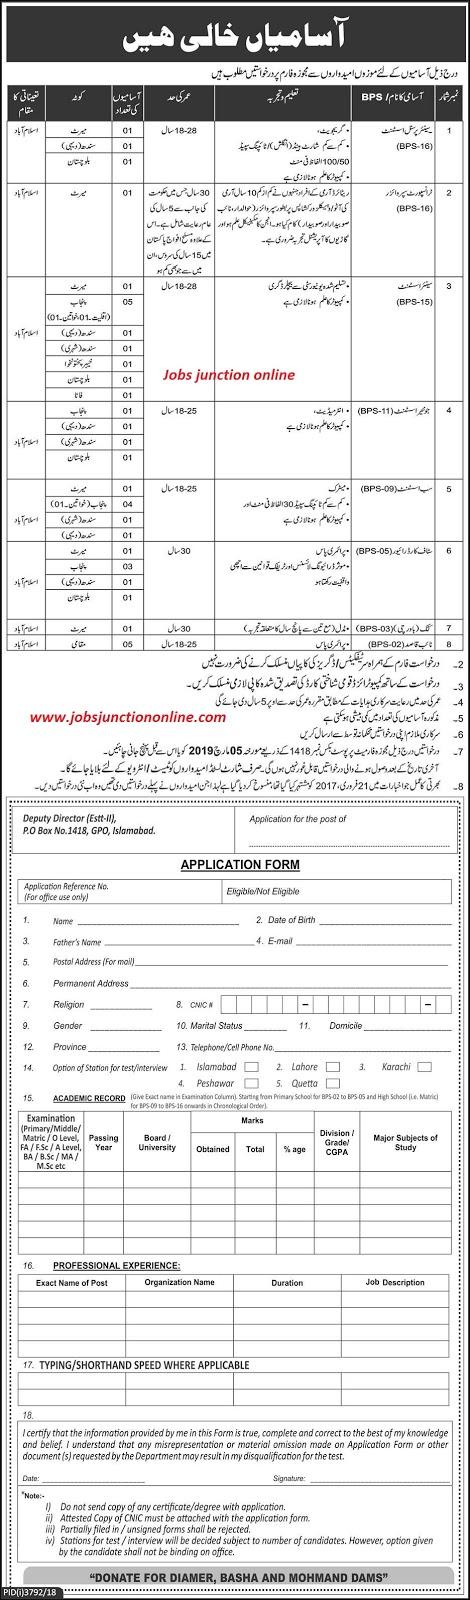 Govt Organization P.O Box 1418 Islamabad Jobs 2019 by Pakistan Army